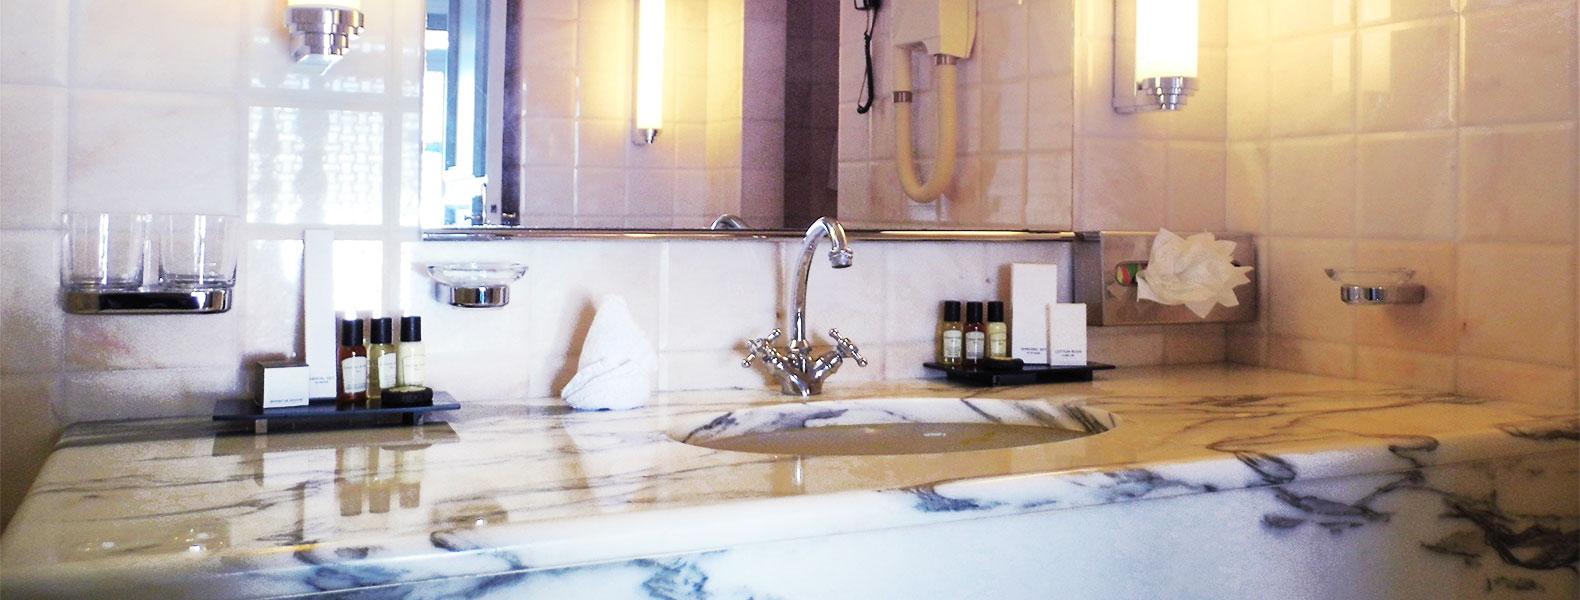 Chambre luxe hotel – sariva.net